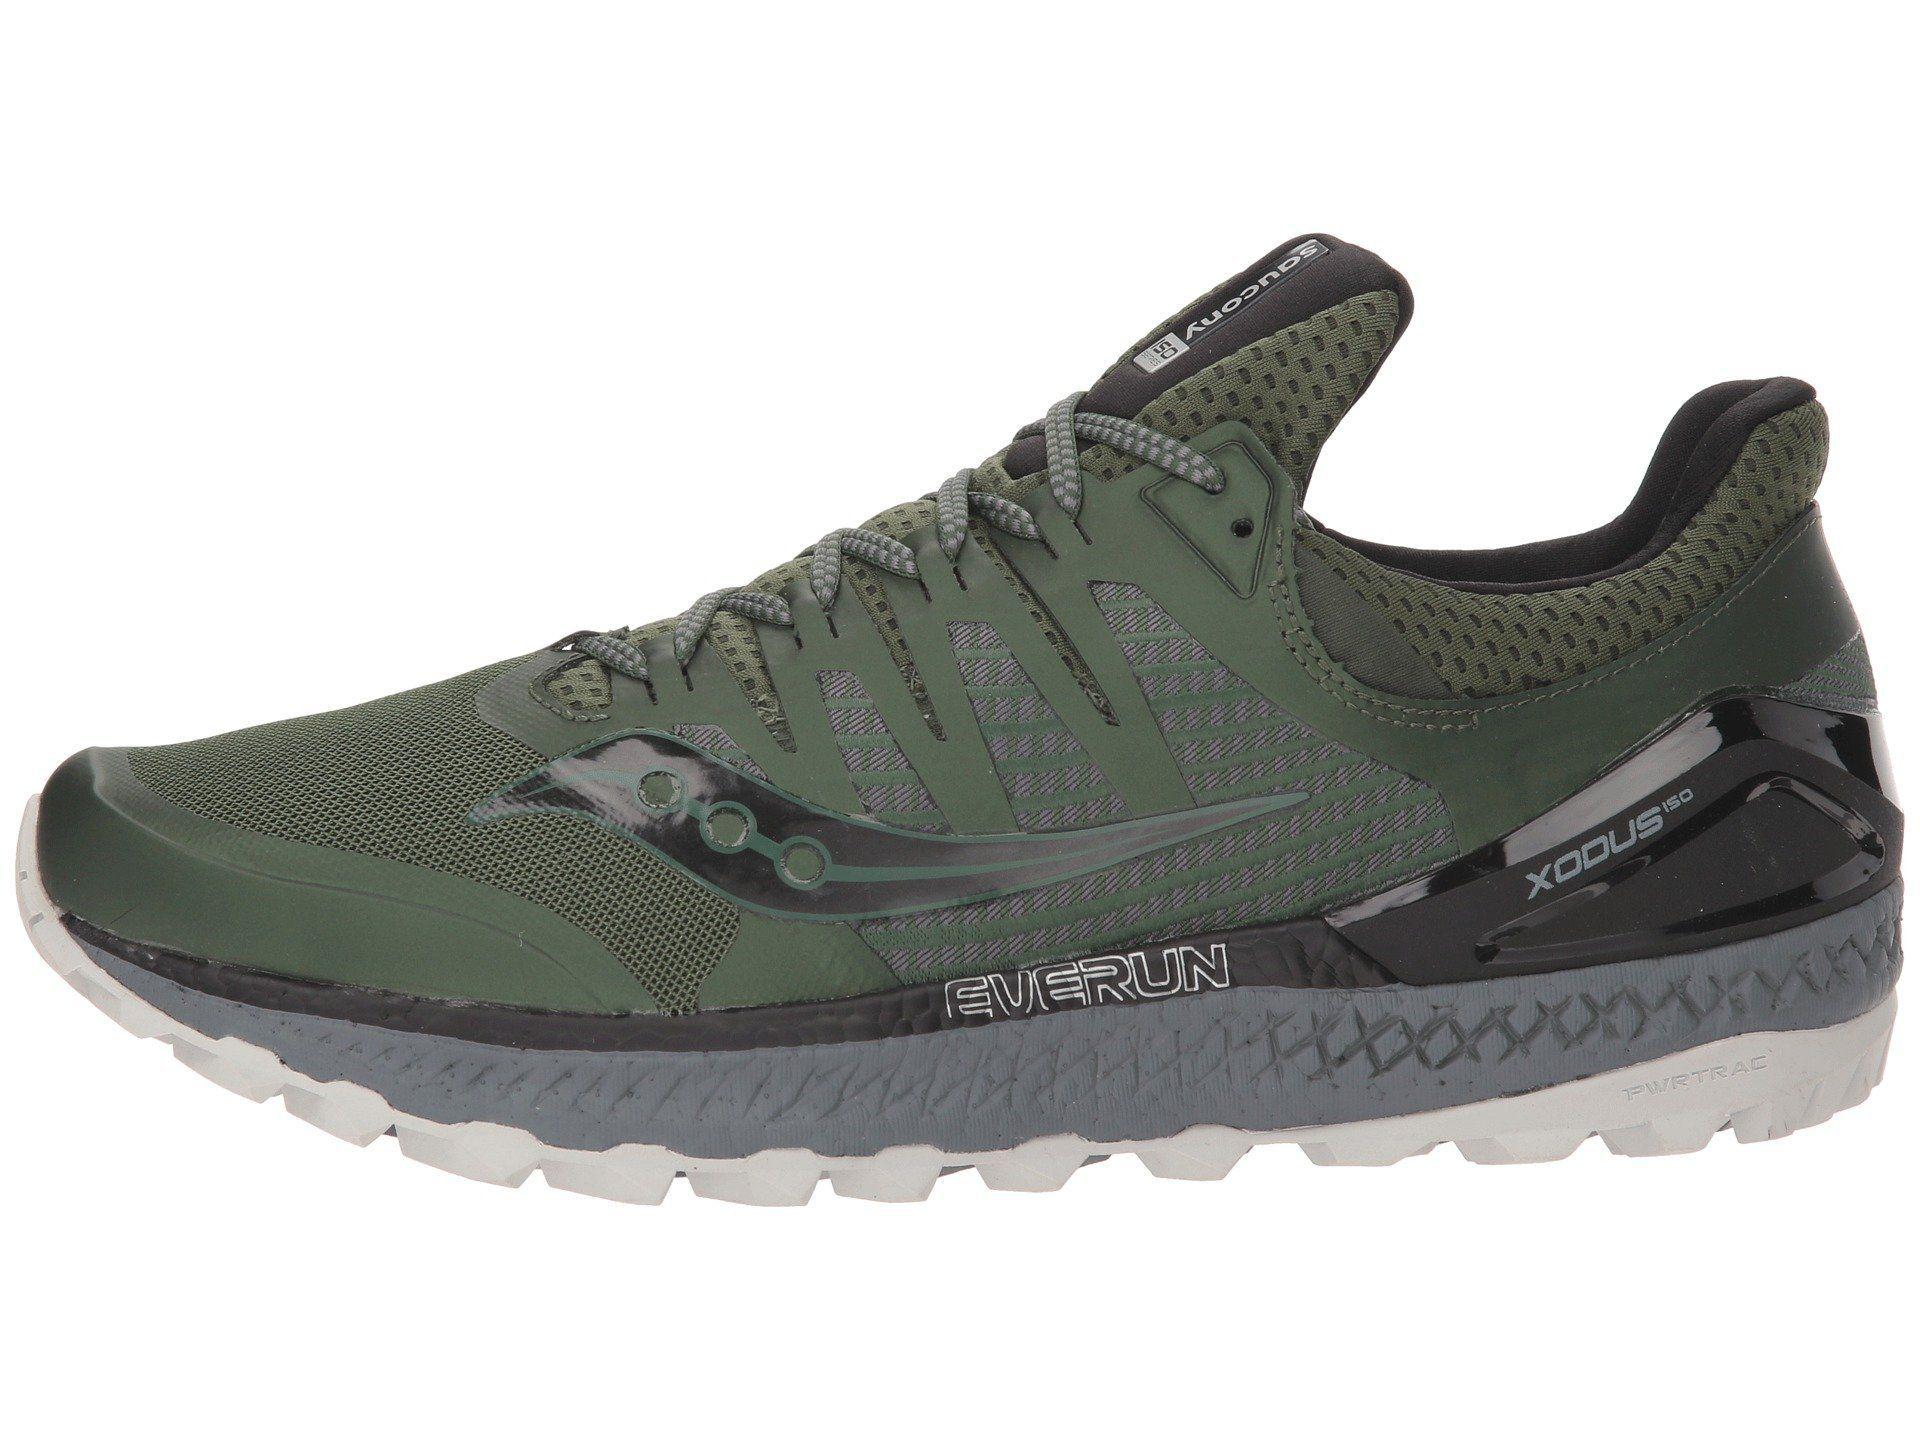 Kilkenny Running Shoes